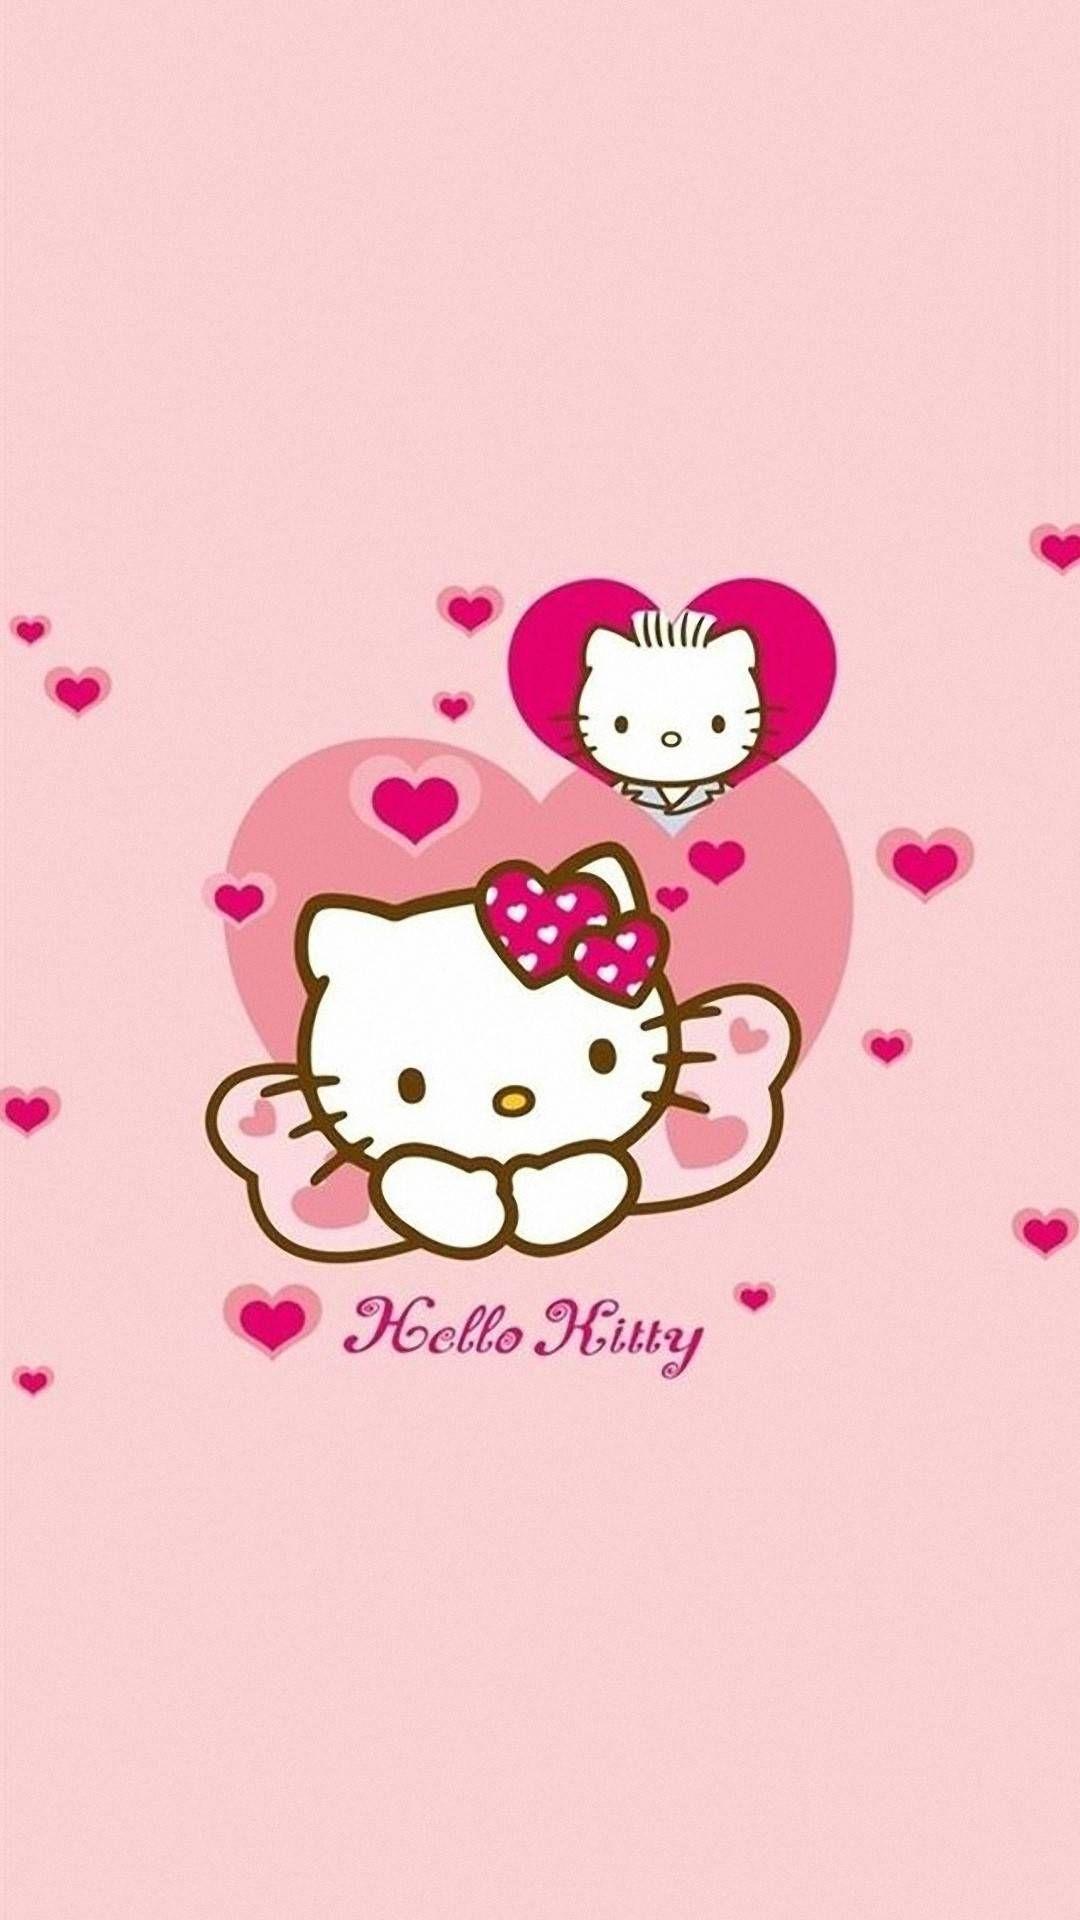 Fantastic Wallpaper Hello Kitty Android Phone - d99e8e448927c259106da18cc0e9c0d7  Trends_404339.jpg